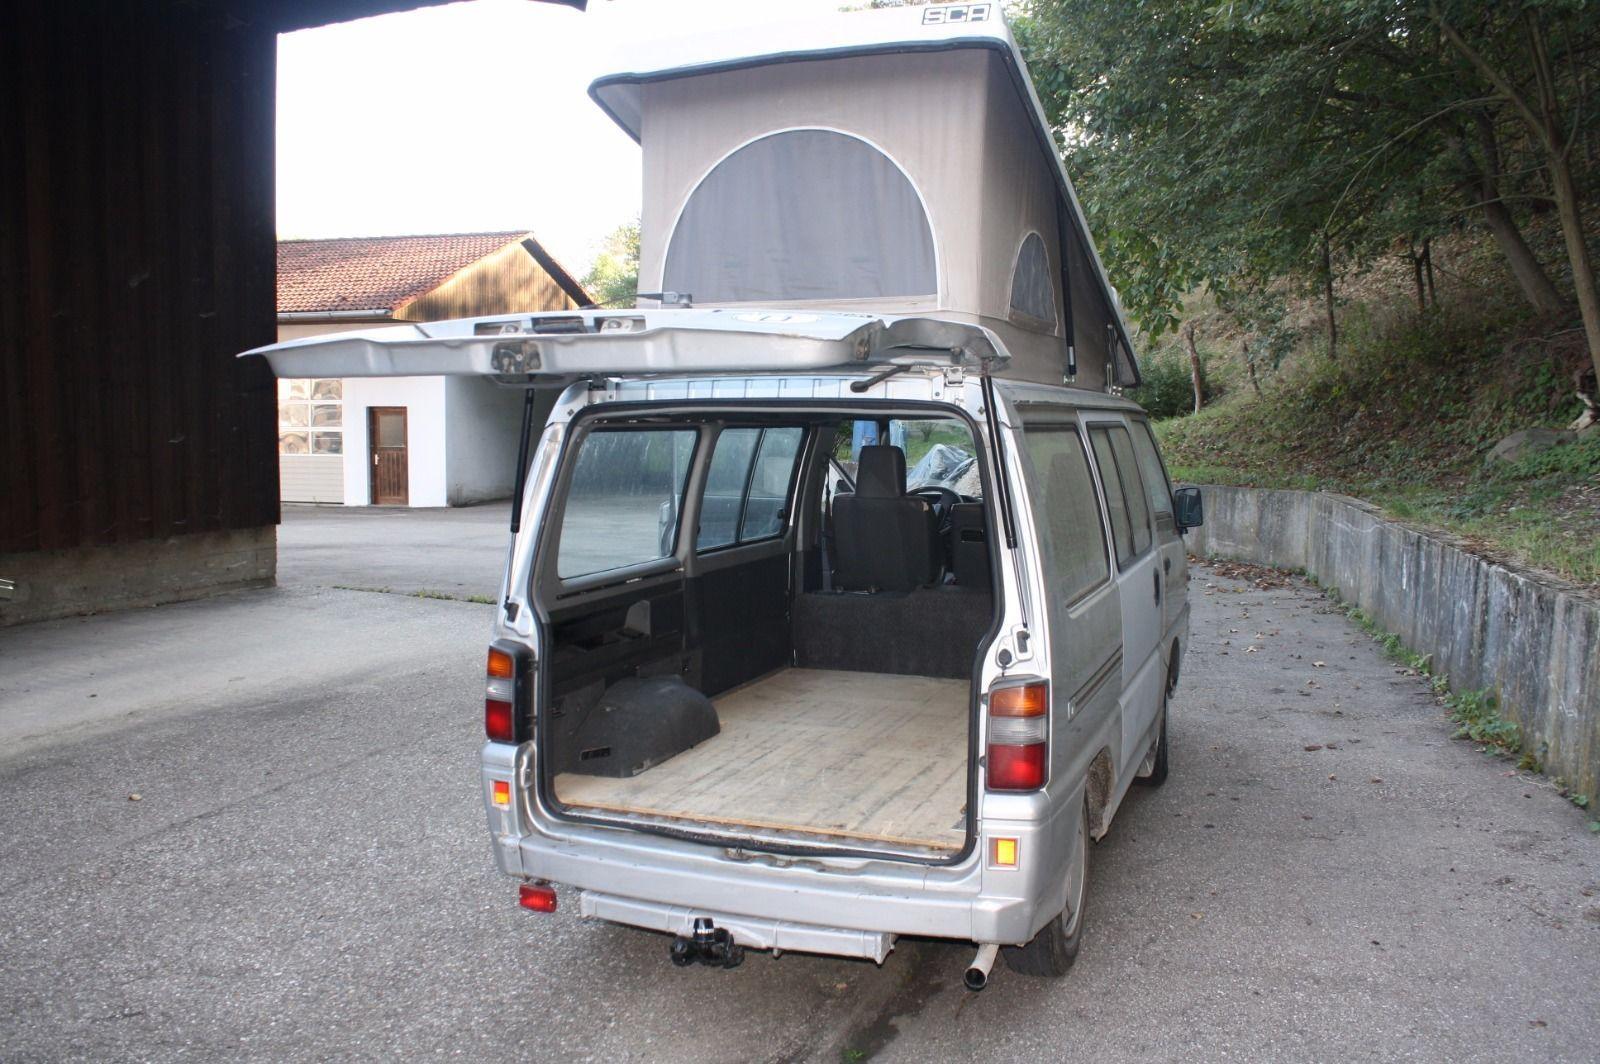 Mitsubishi L300 Wohnmobil | EBay